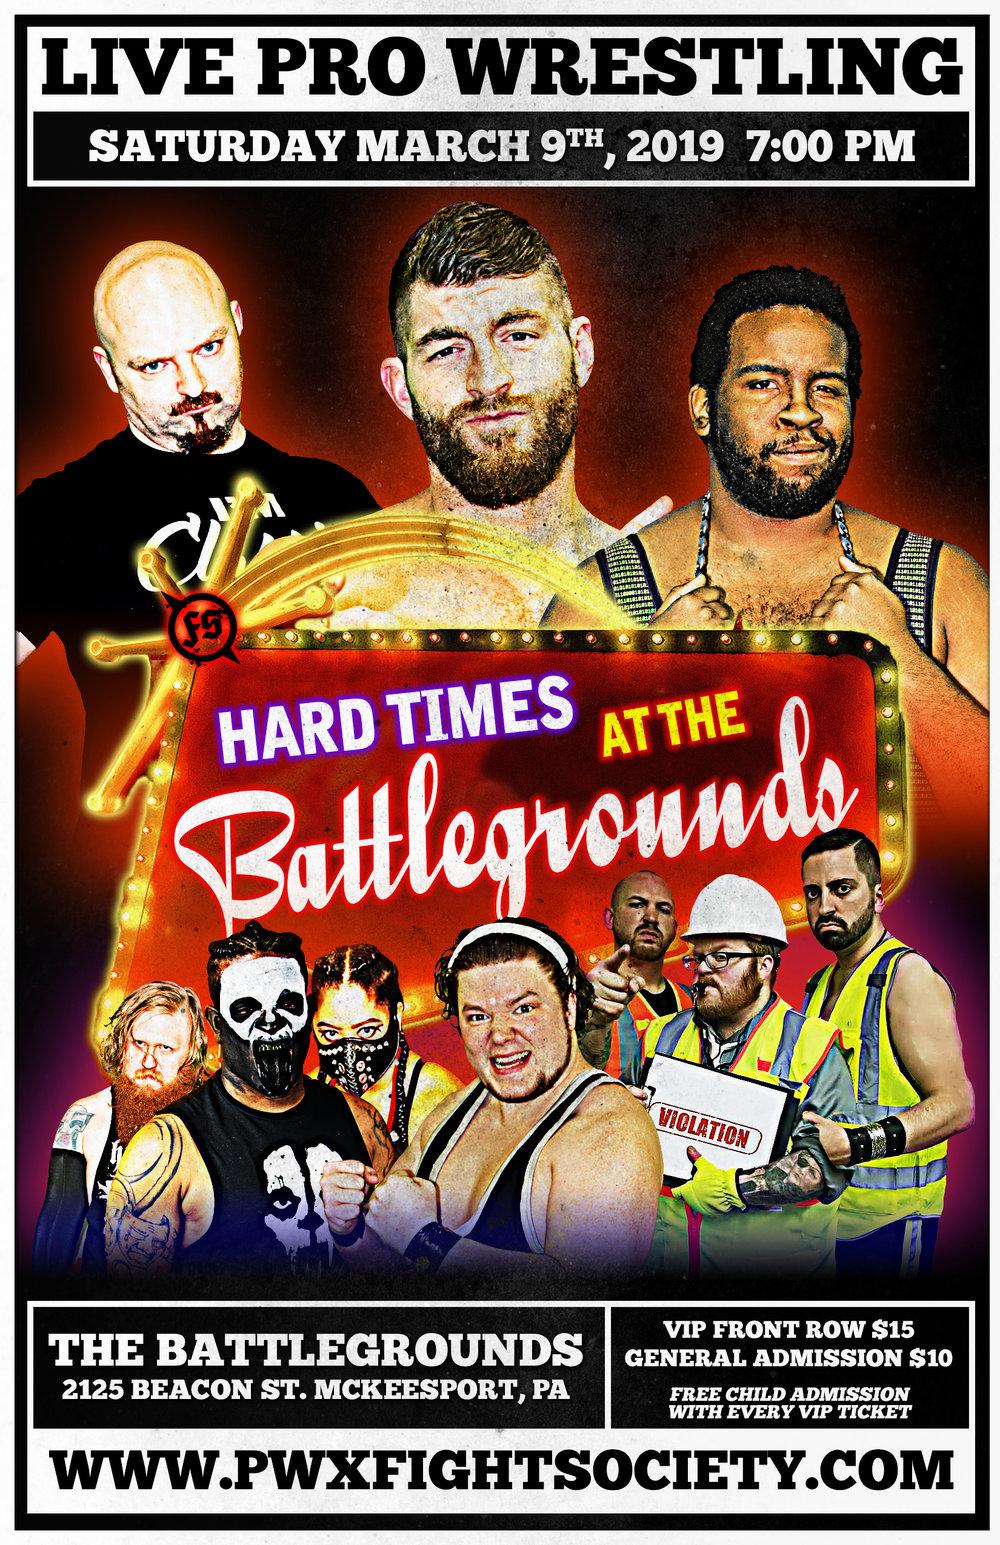 Hard Times at the Battlegrounds